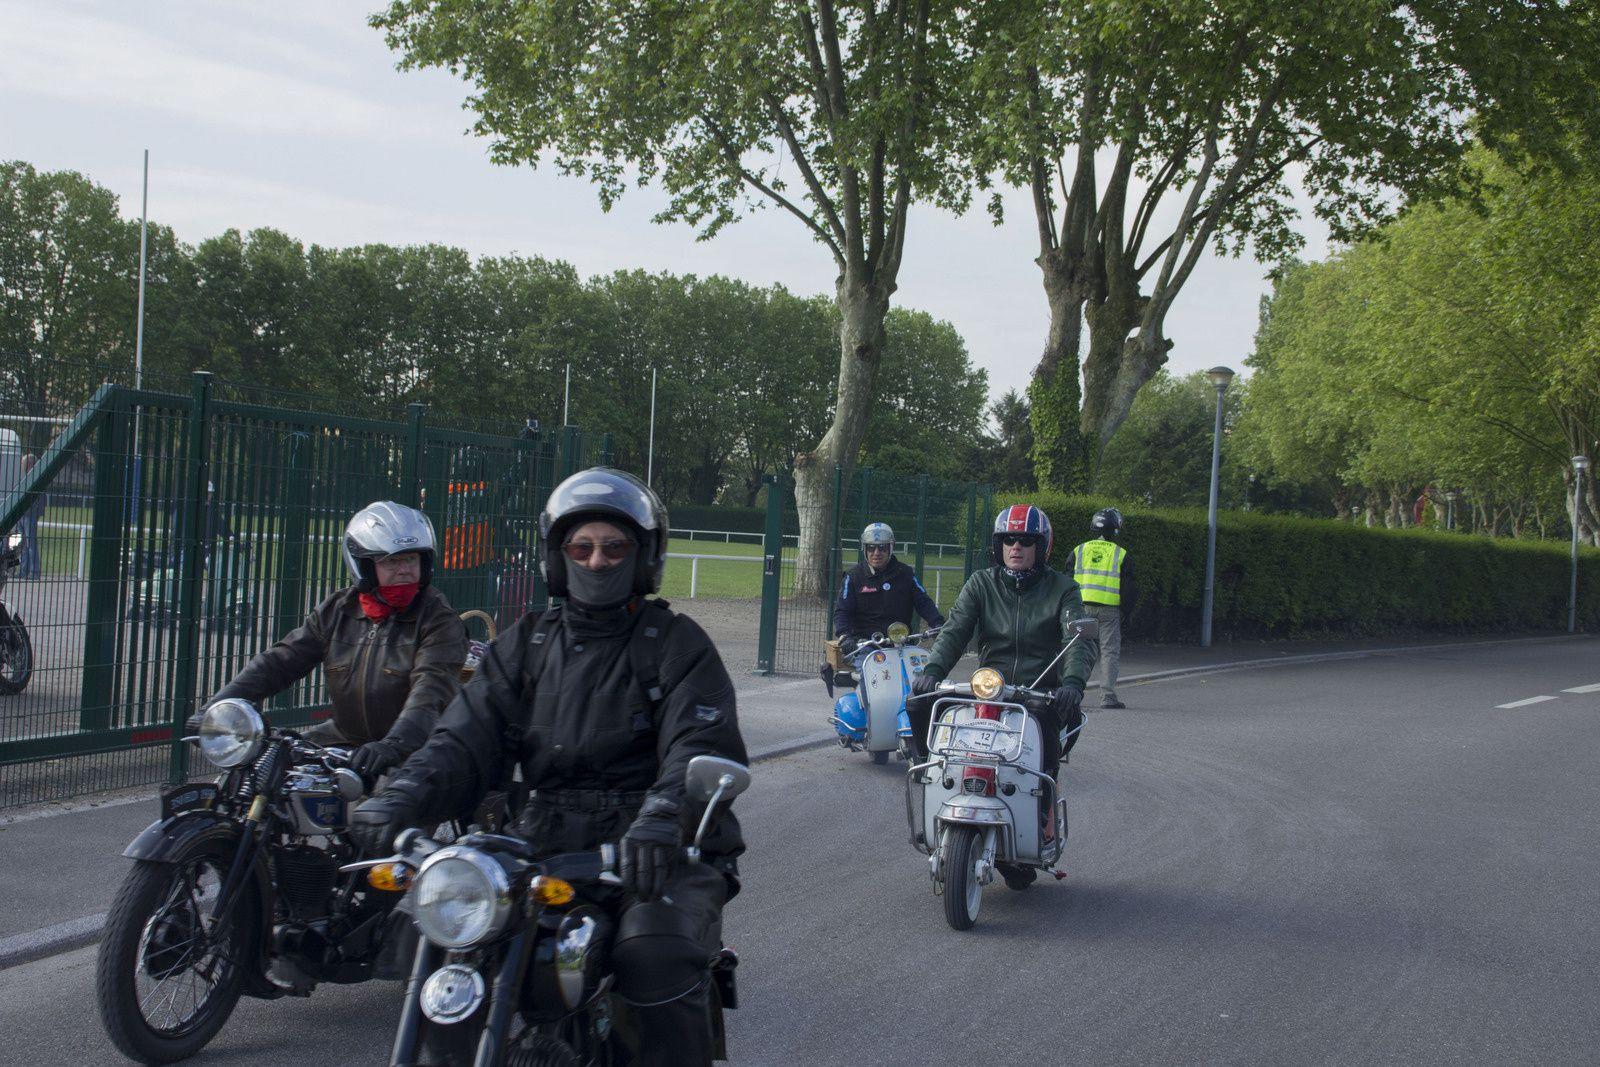 Lieu de départ de la rando rétro moto 2015. Stade du Holtzplatz, rue des sports, Molsheim (Alsace - 67)